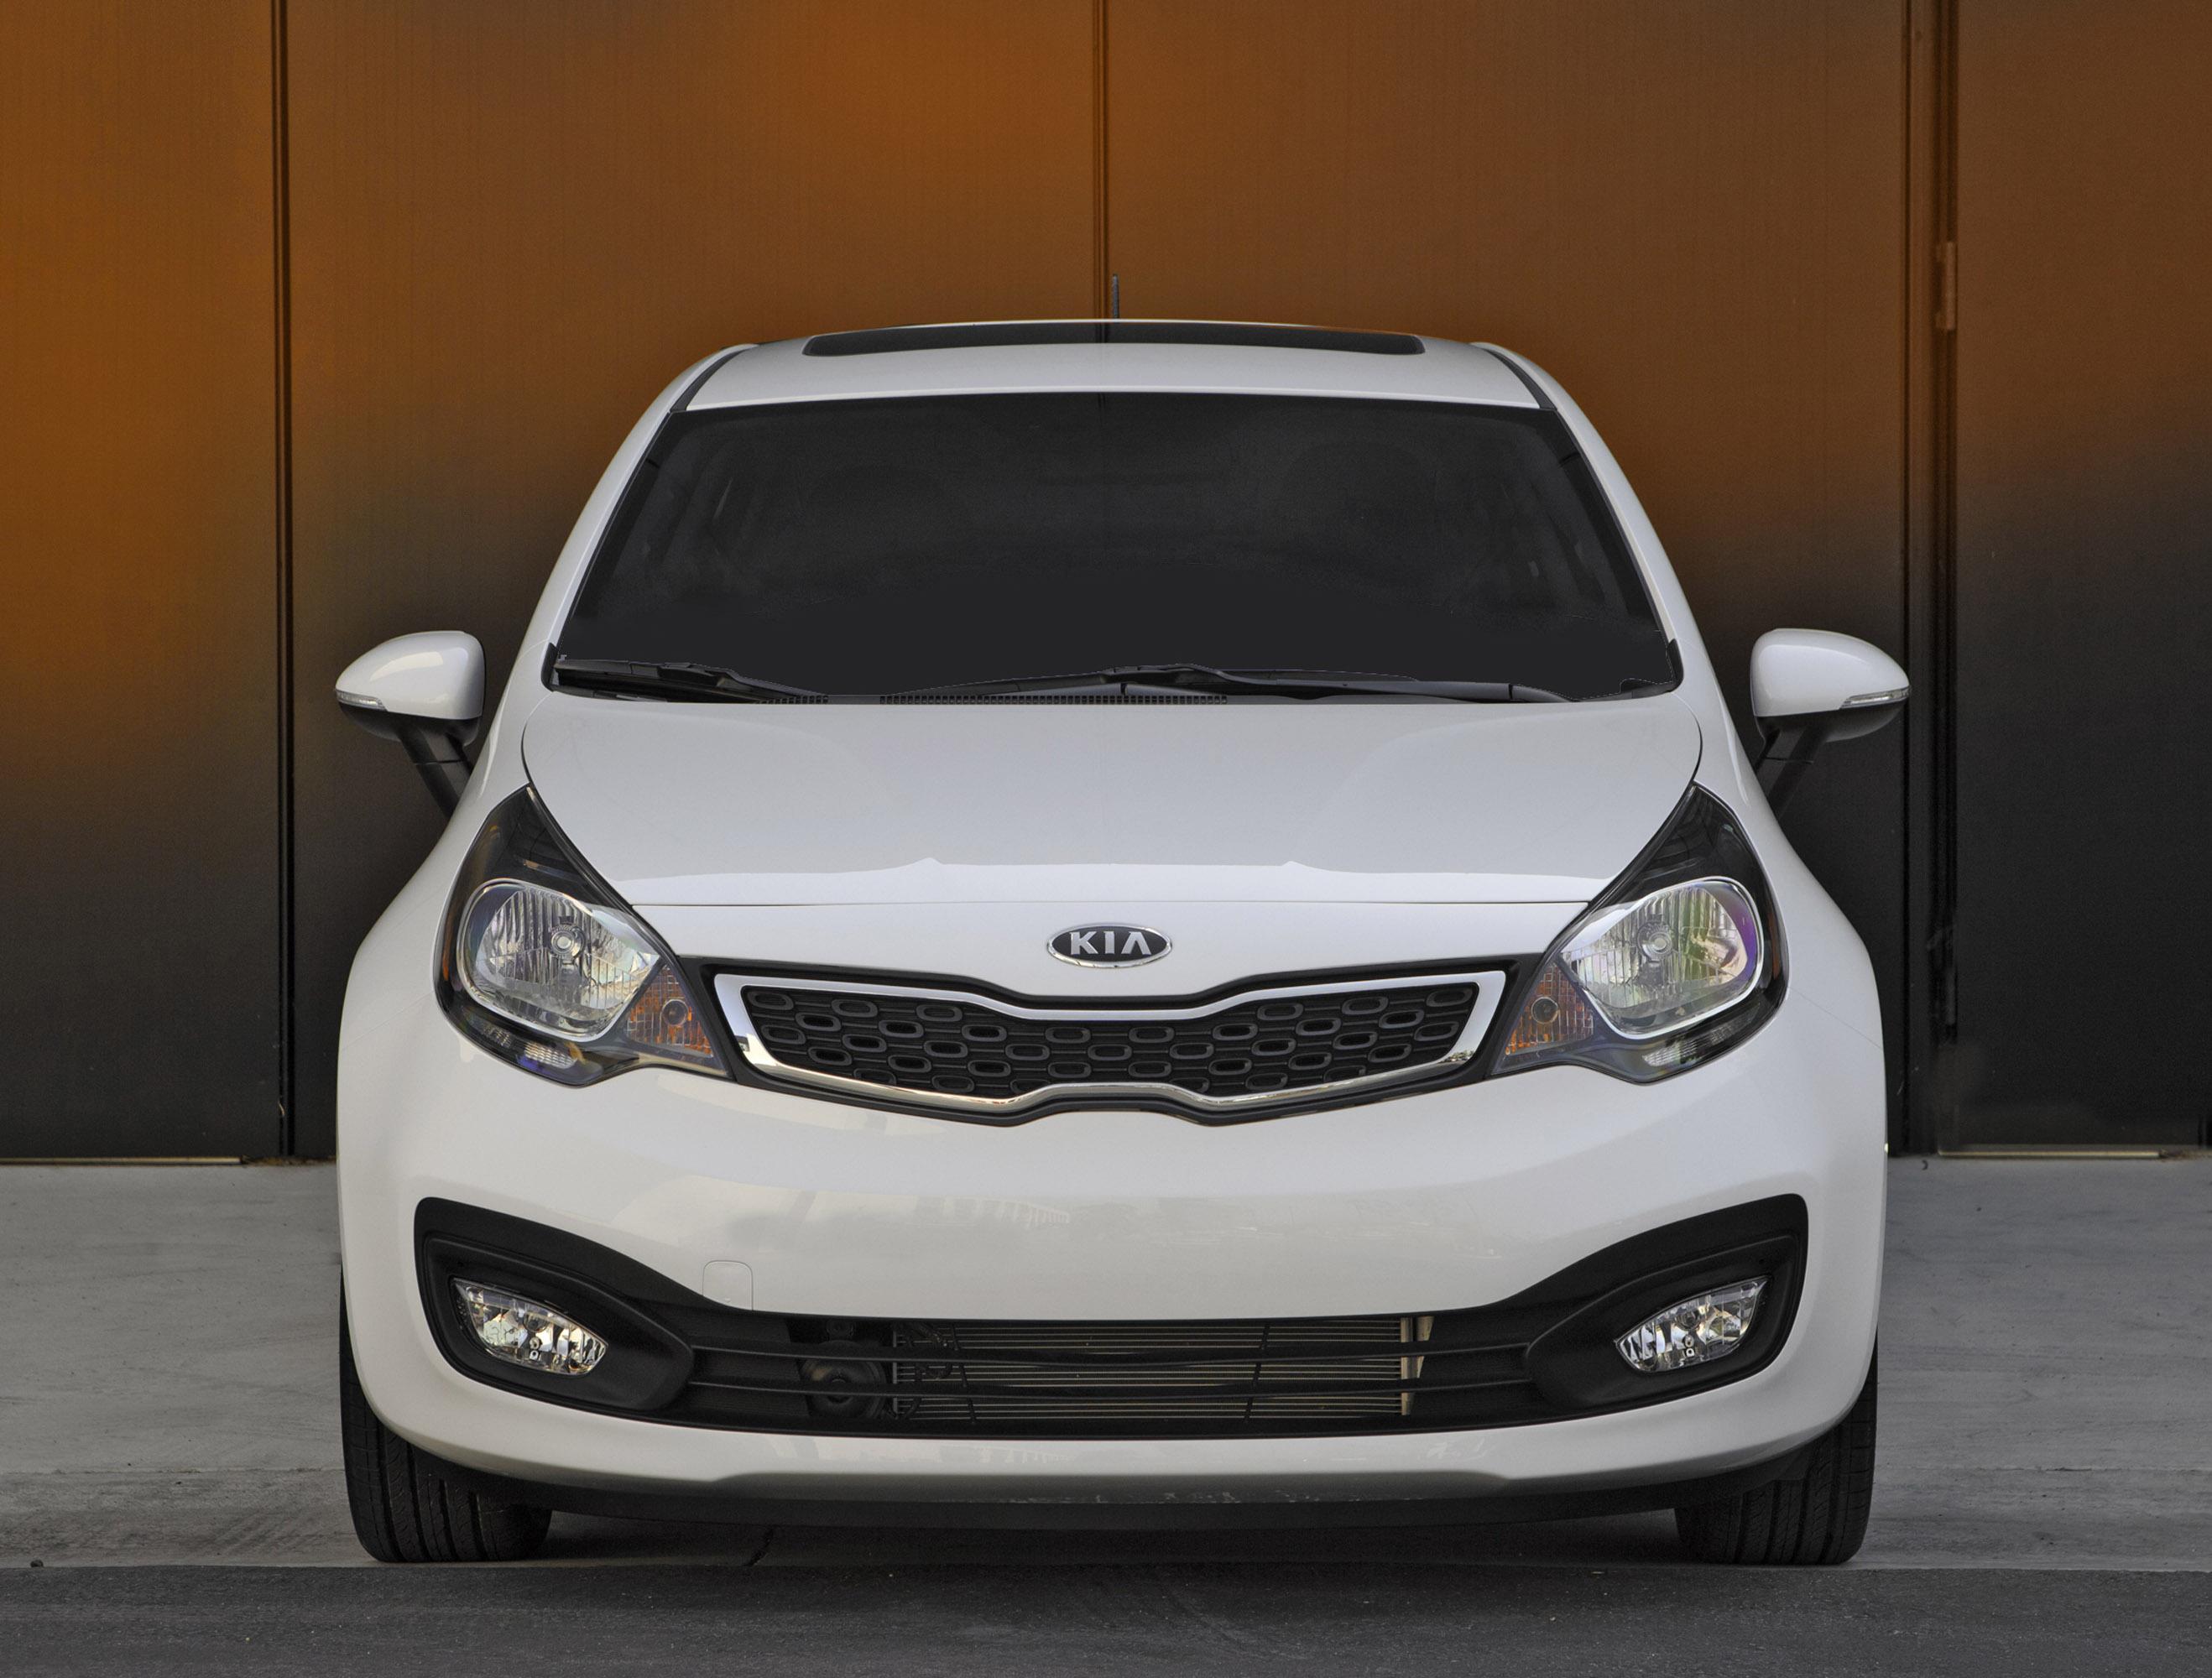 Kia Describes 2015 Rio Sedan